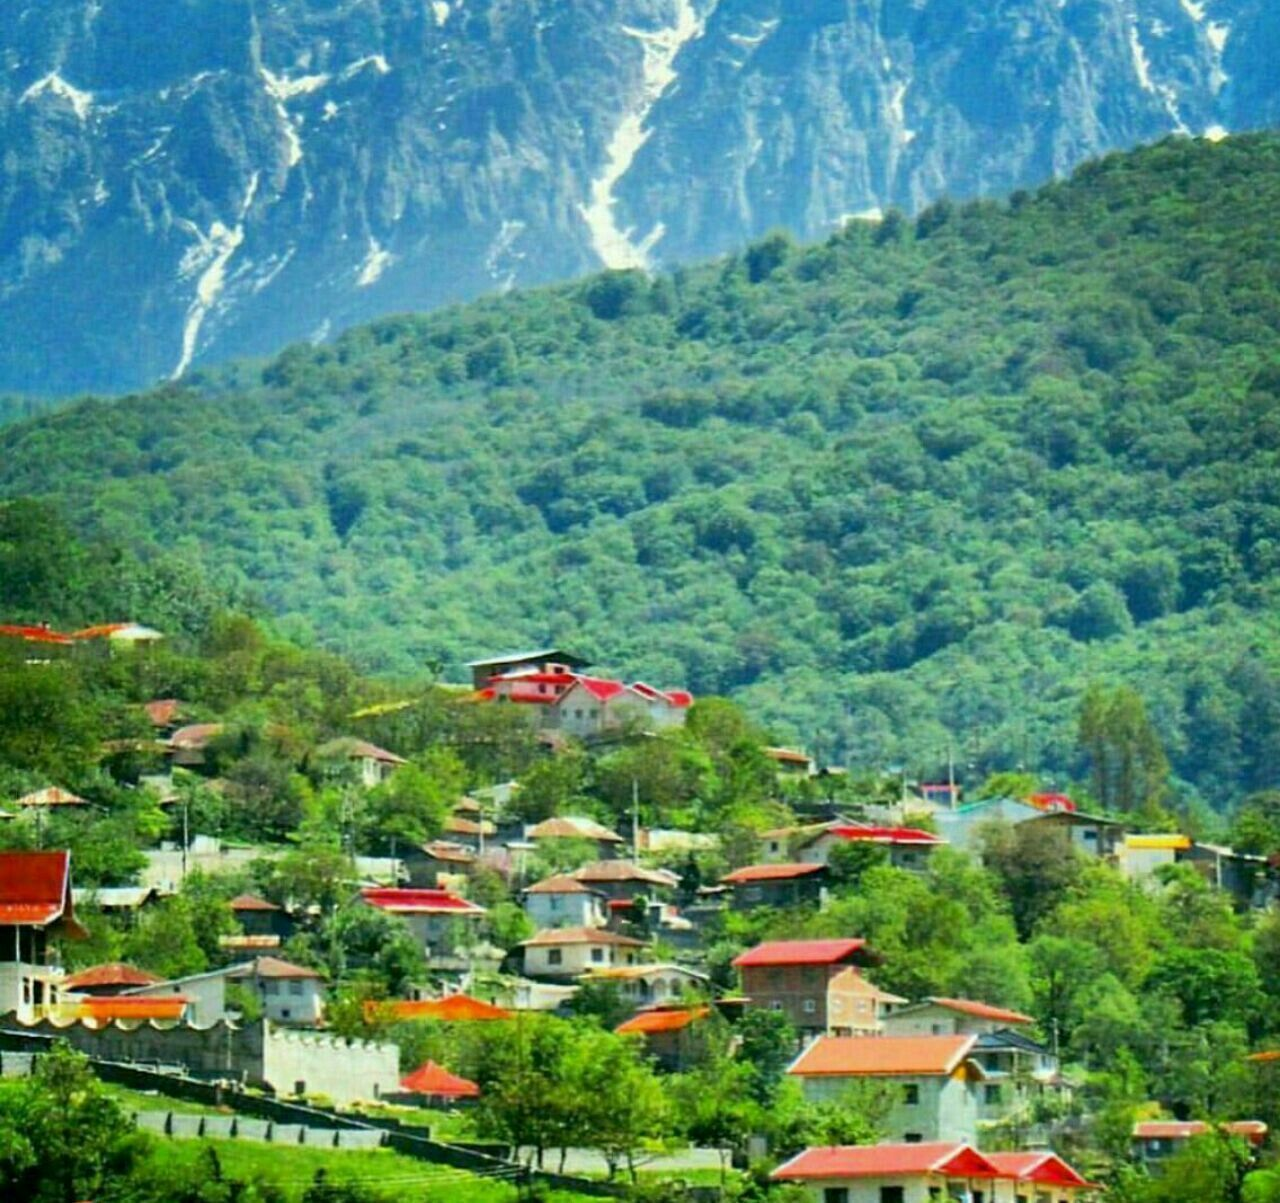 SavadKooh Mazandaran, Iran | Iran tourism, Iran travel, Iran pictures